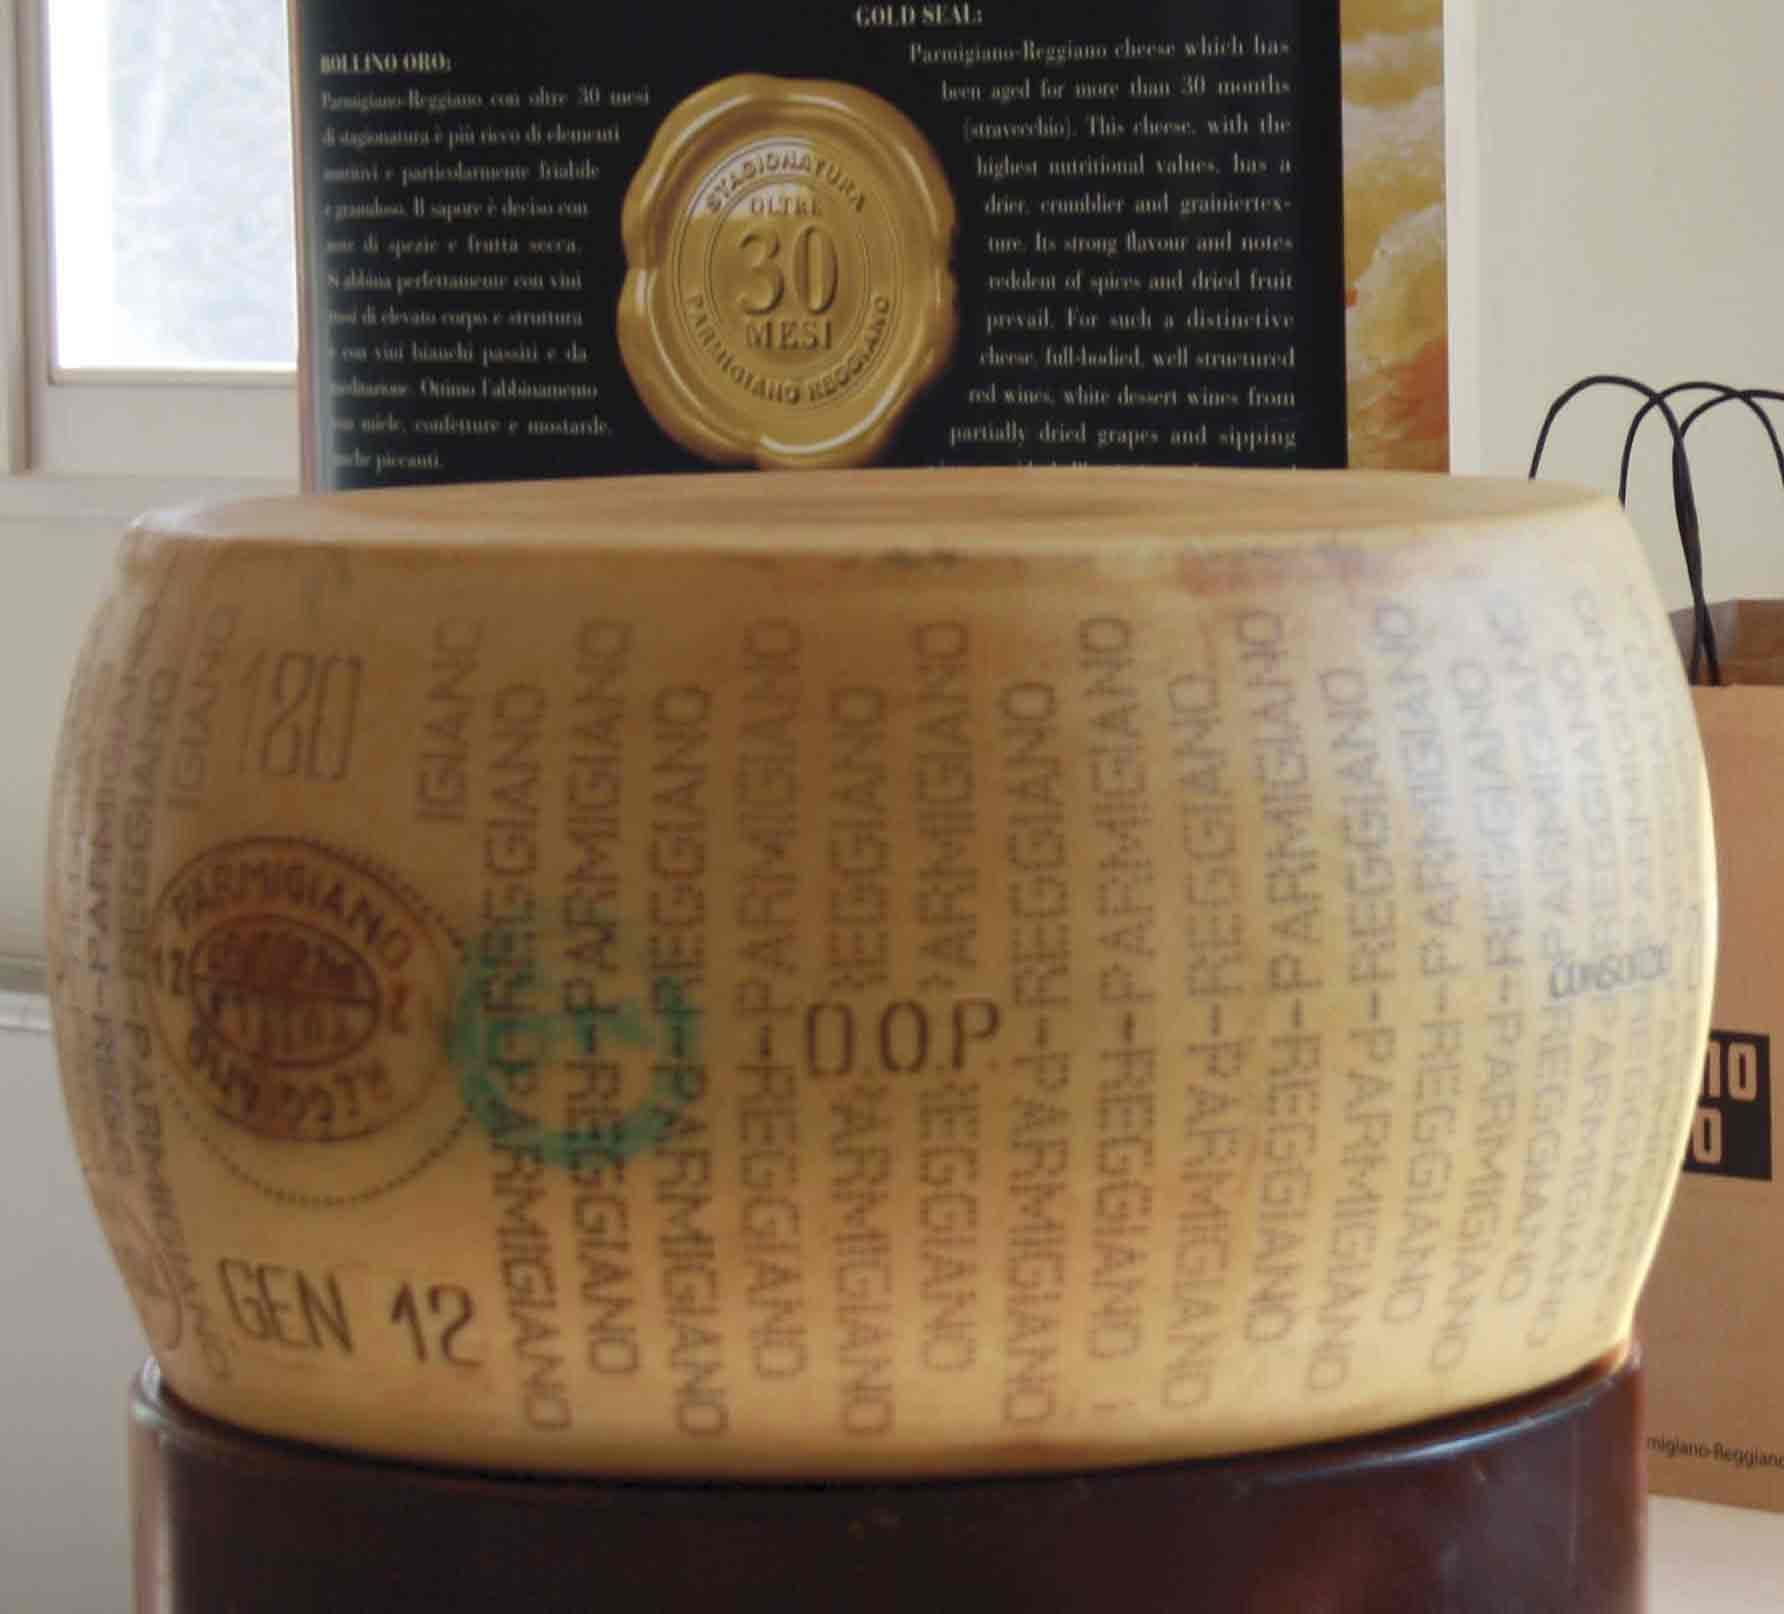 parmigiano reggiano forma ilnordestquotidiano